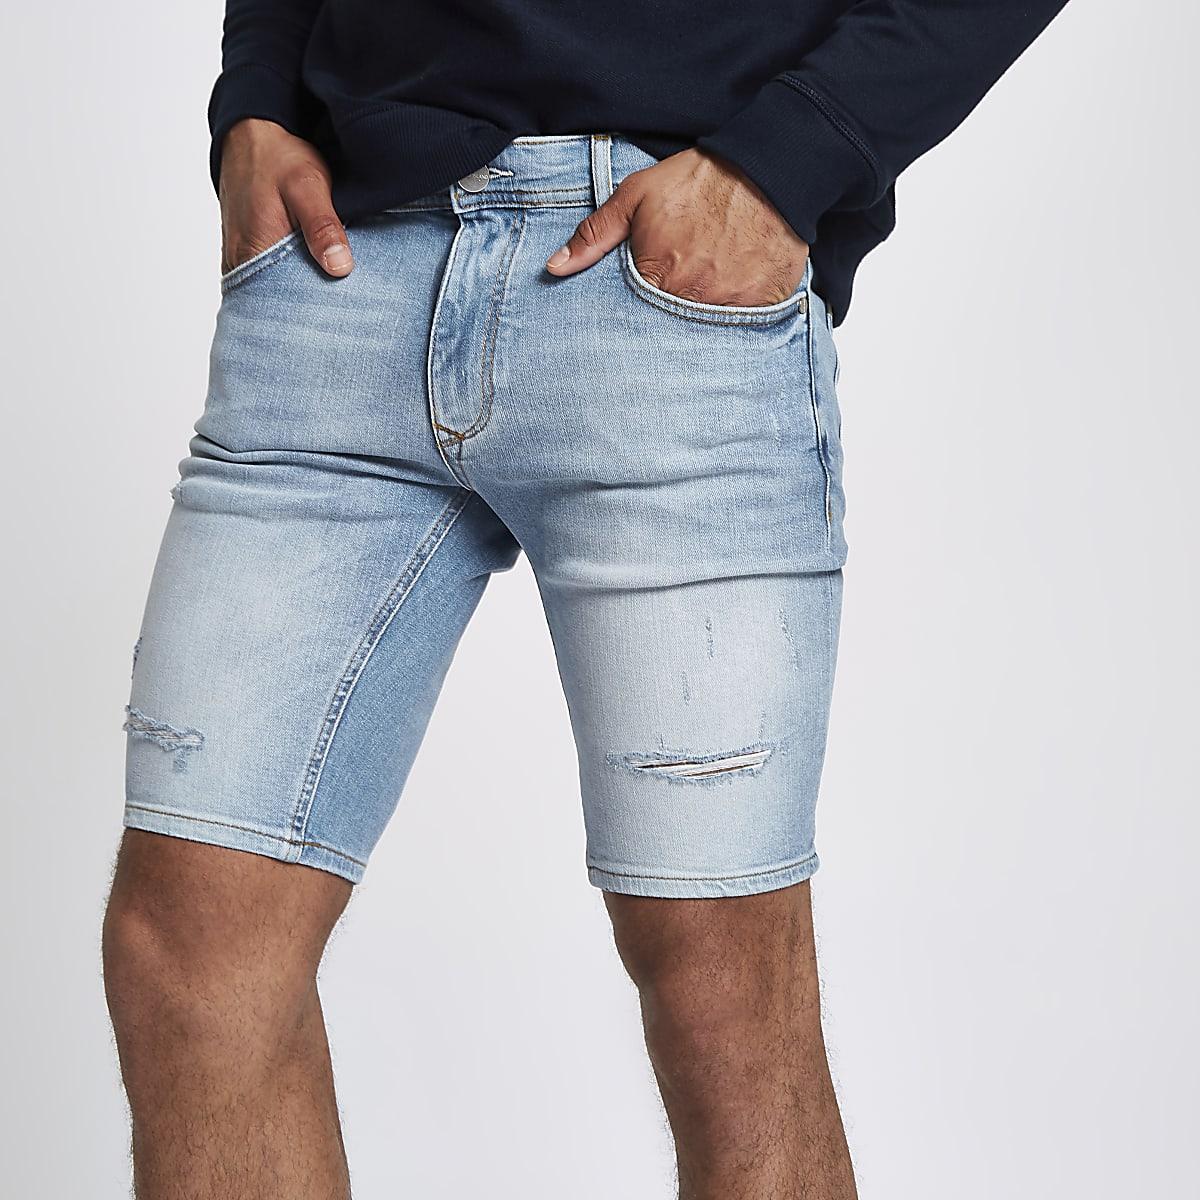 Light blue skinny denim ripped shorts